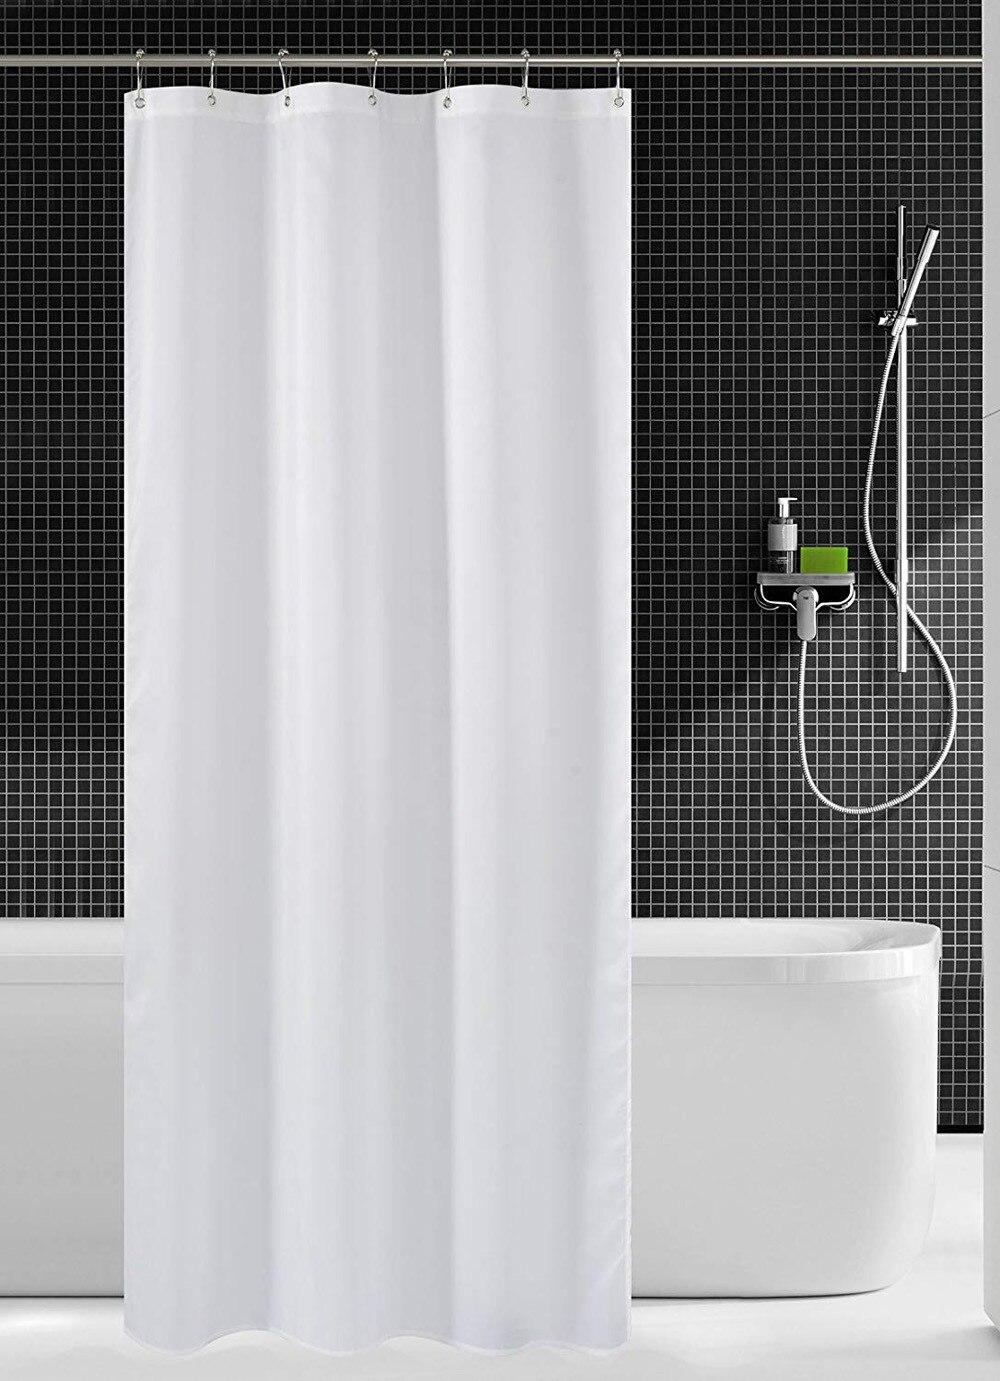 Bath Shower Curtains For Bathroom